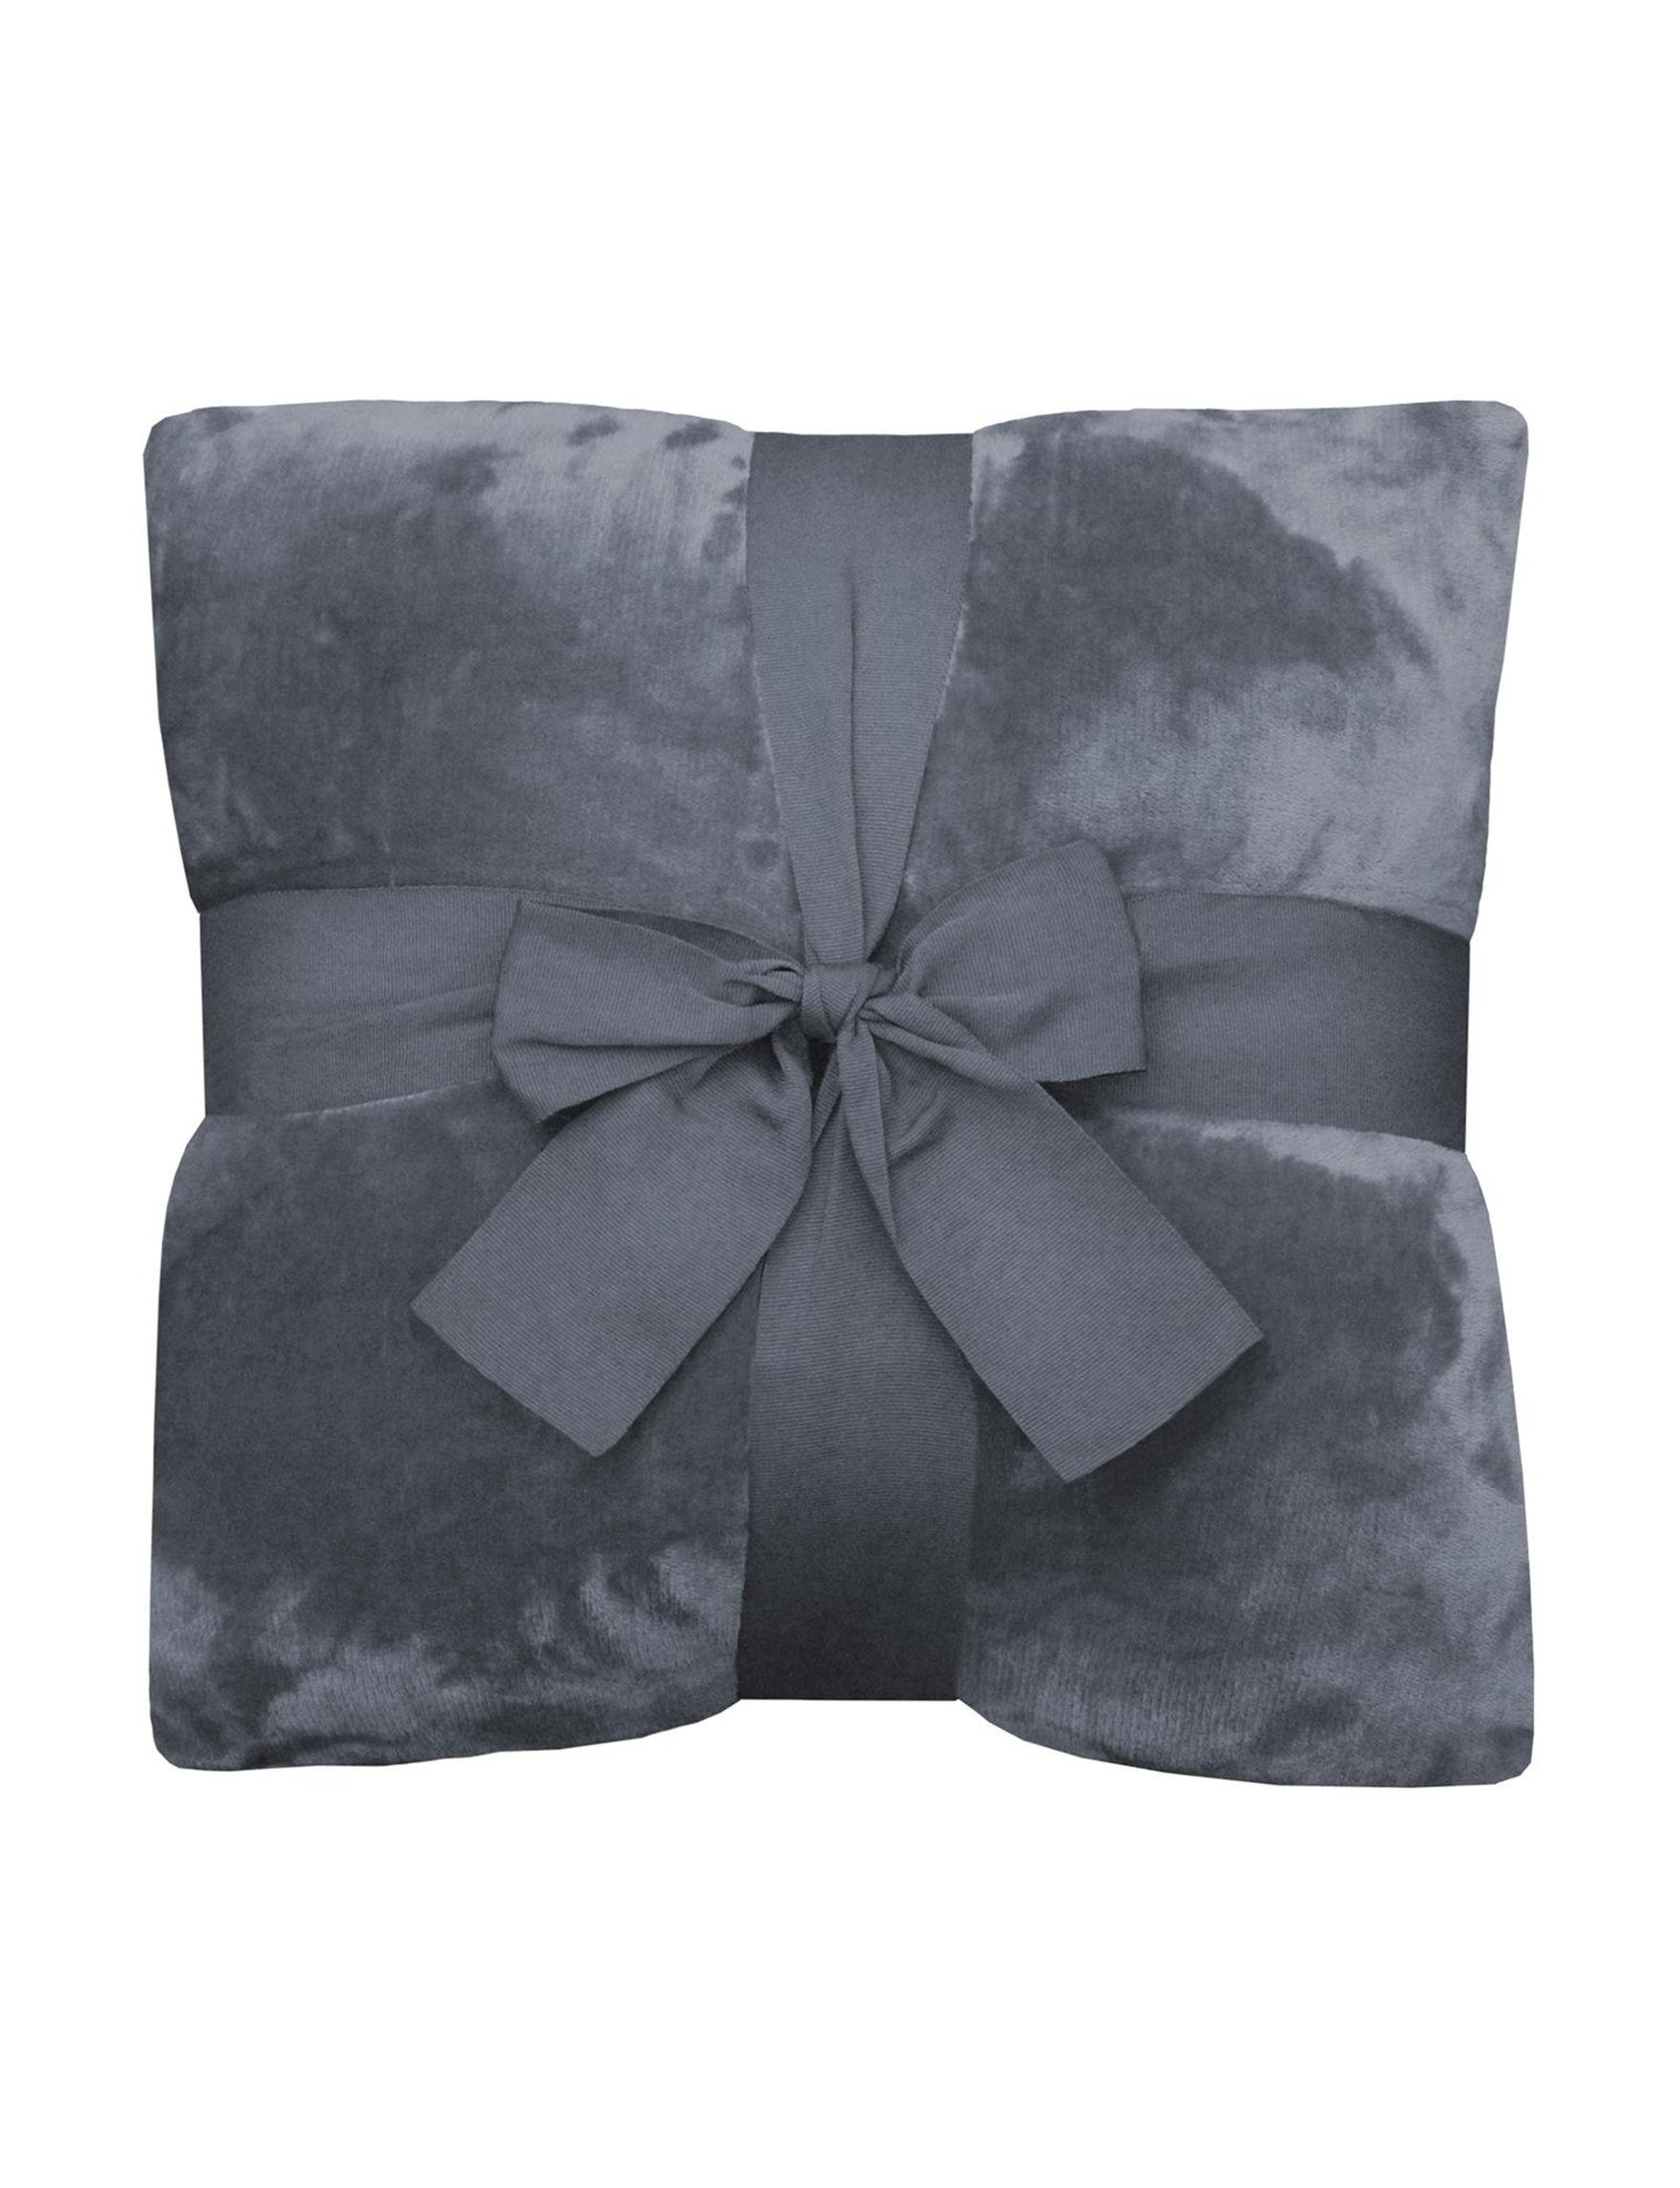 Newport Blue Navy Decorative Pillows